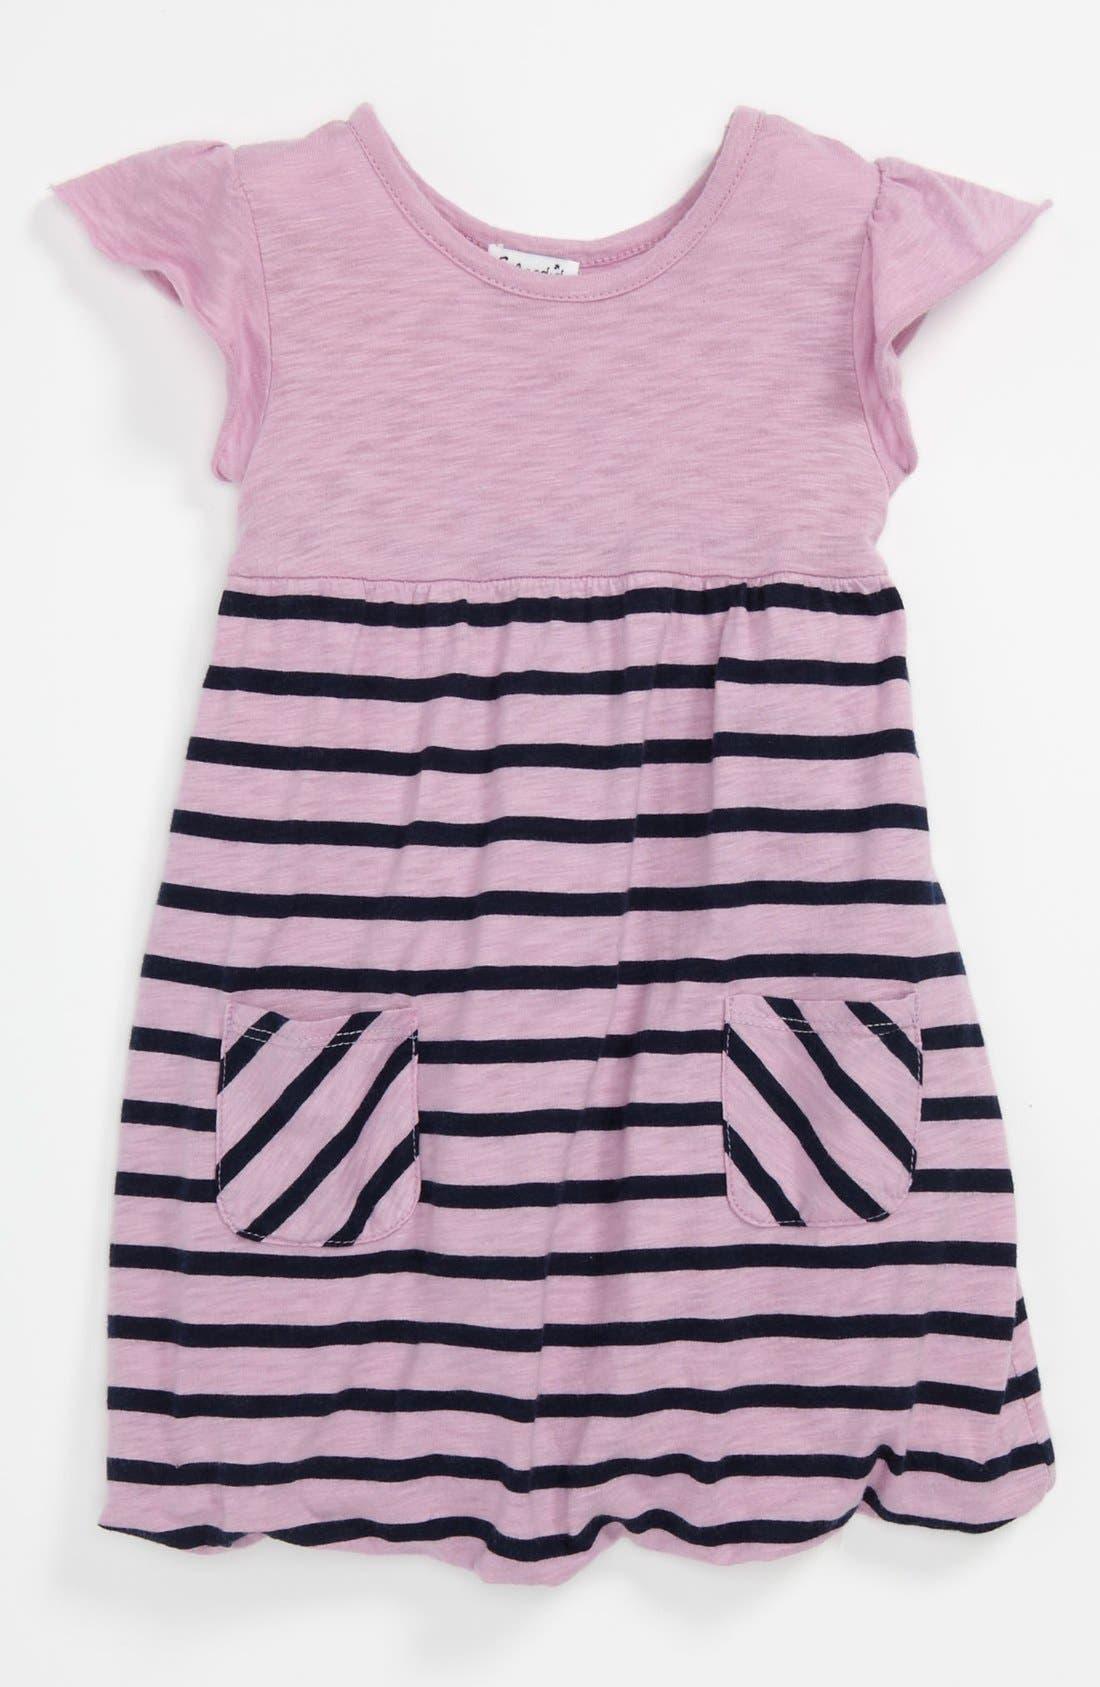 Alternate Image 1 Selected - Splendid 'Miami' Stripe Dress (Baby)